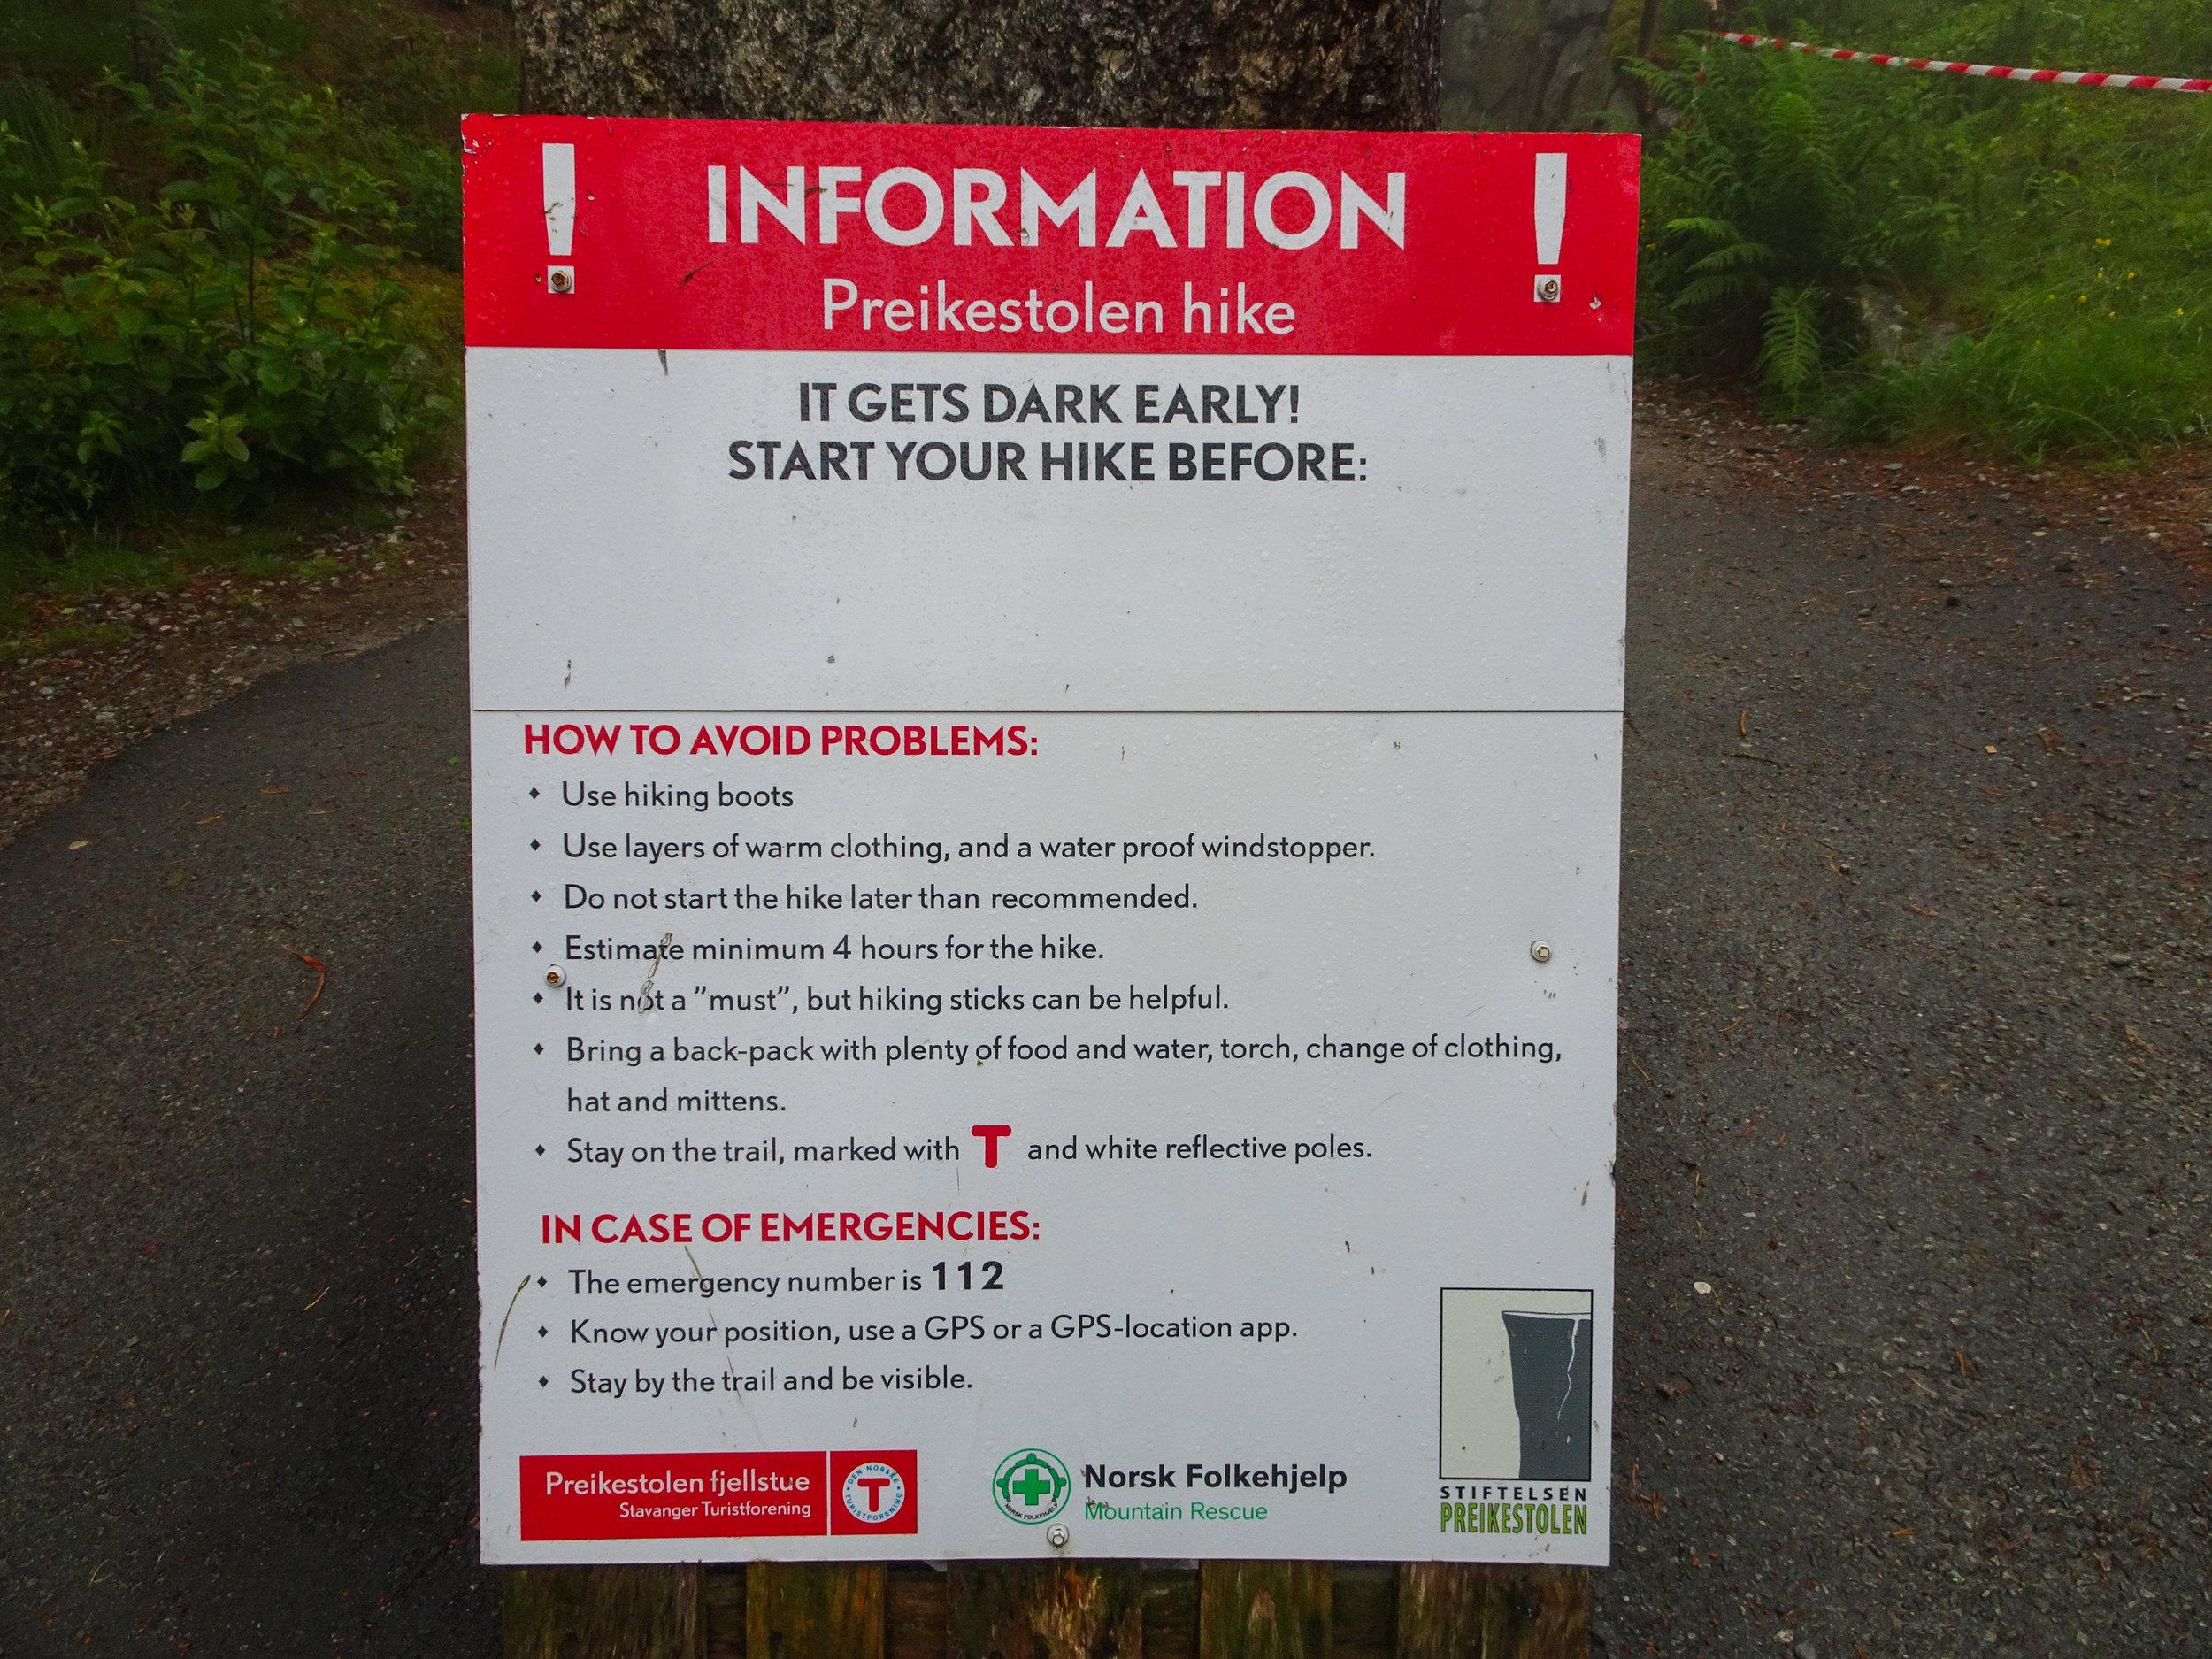 pulpit rock safety information.jpg